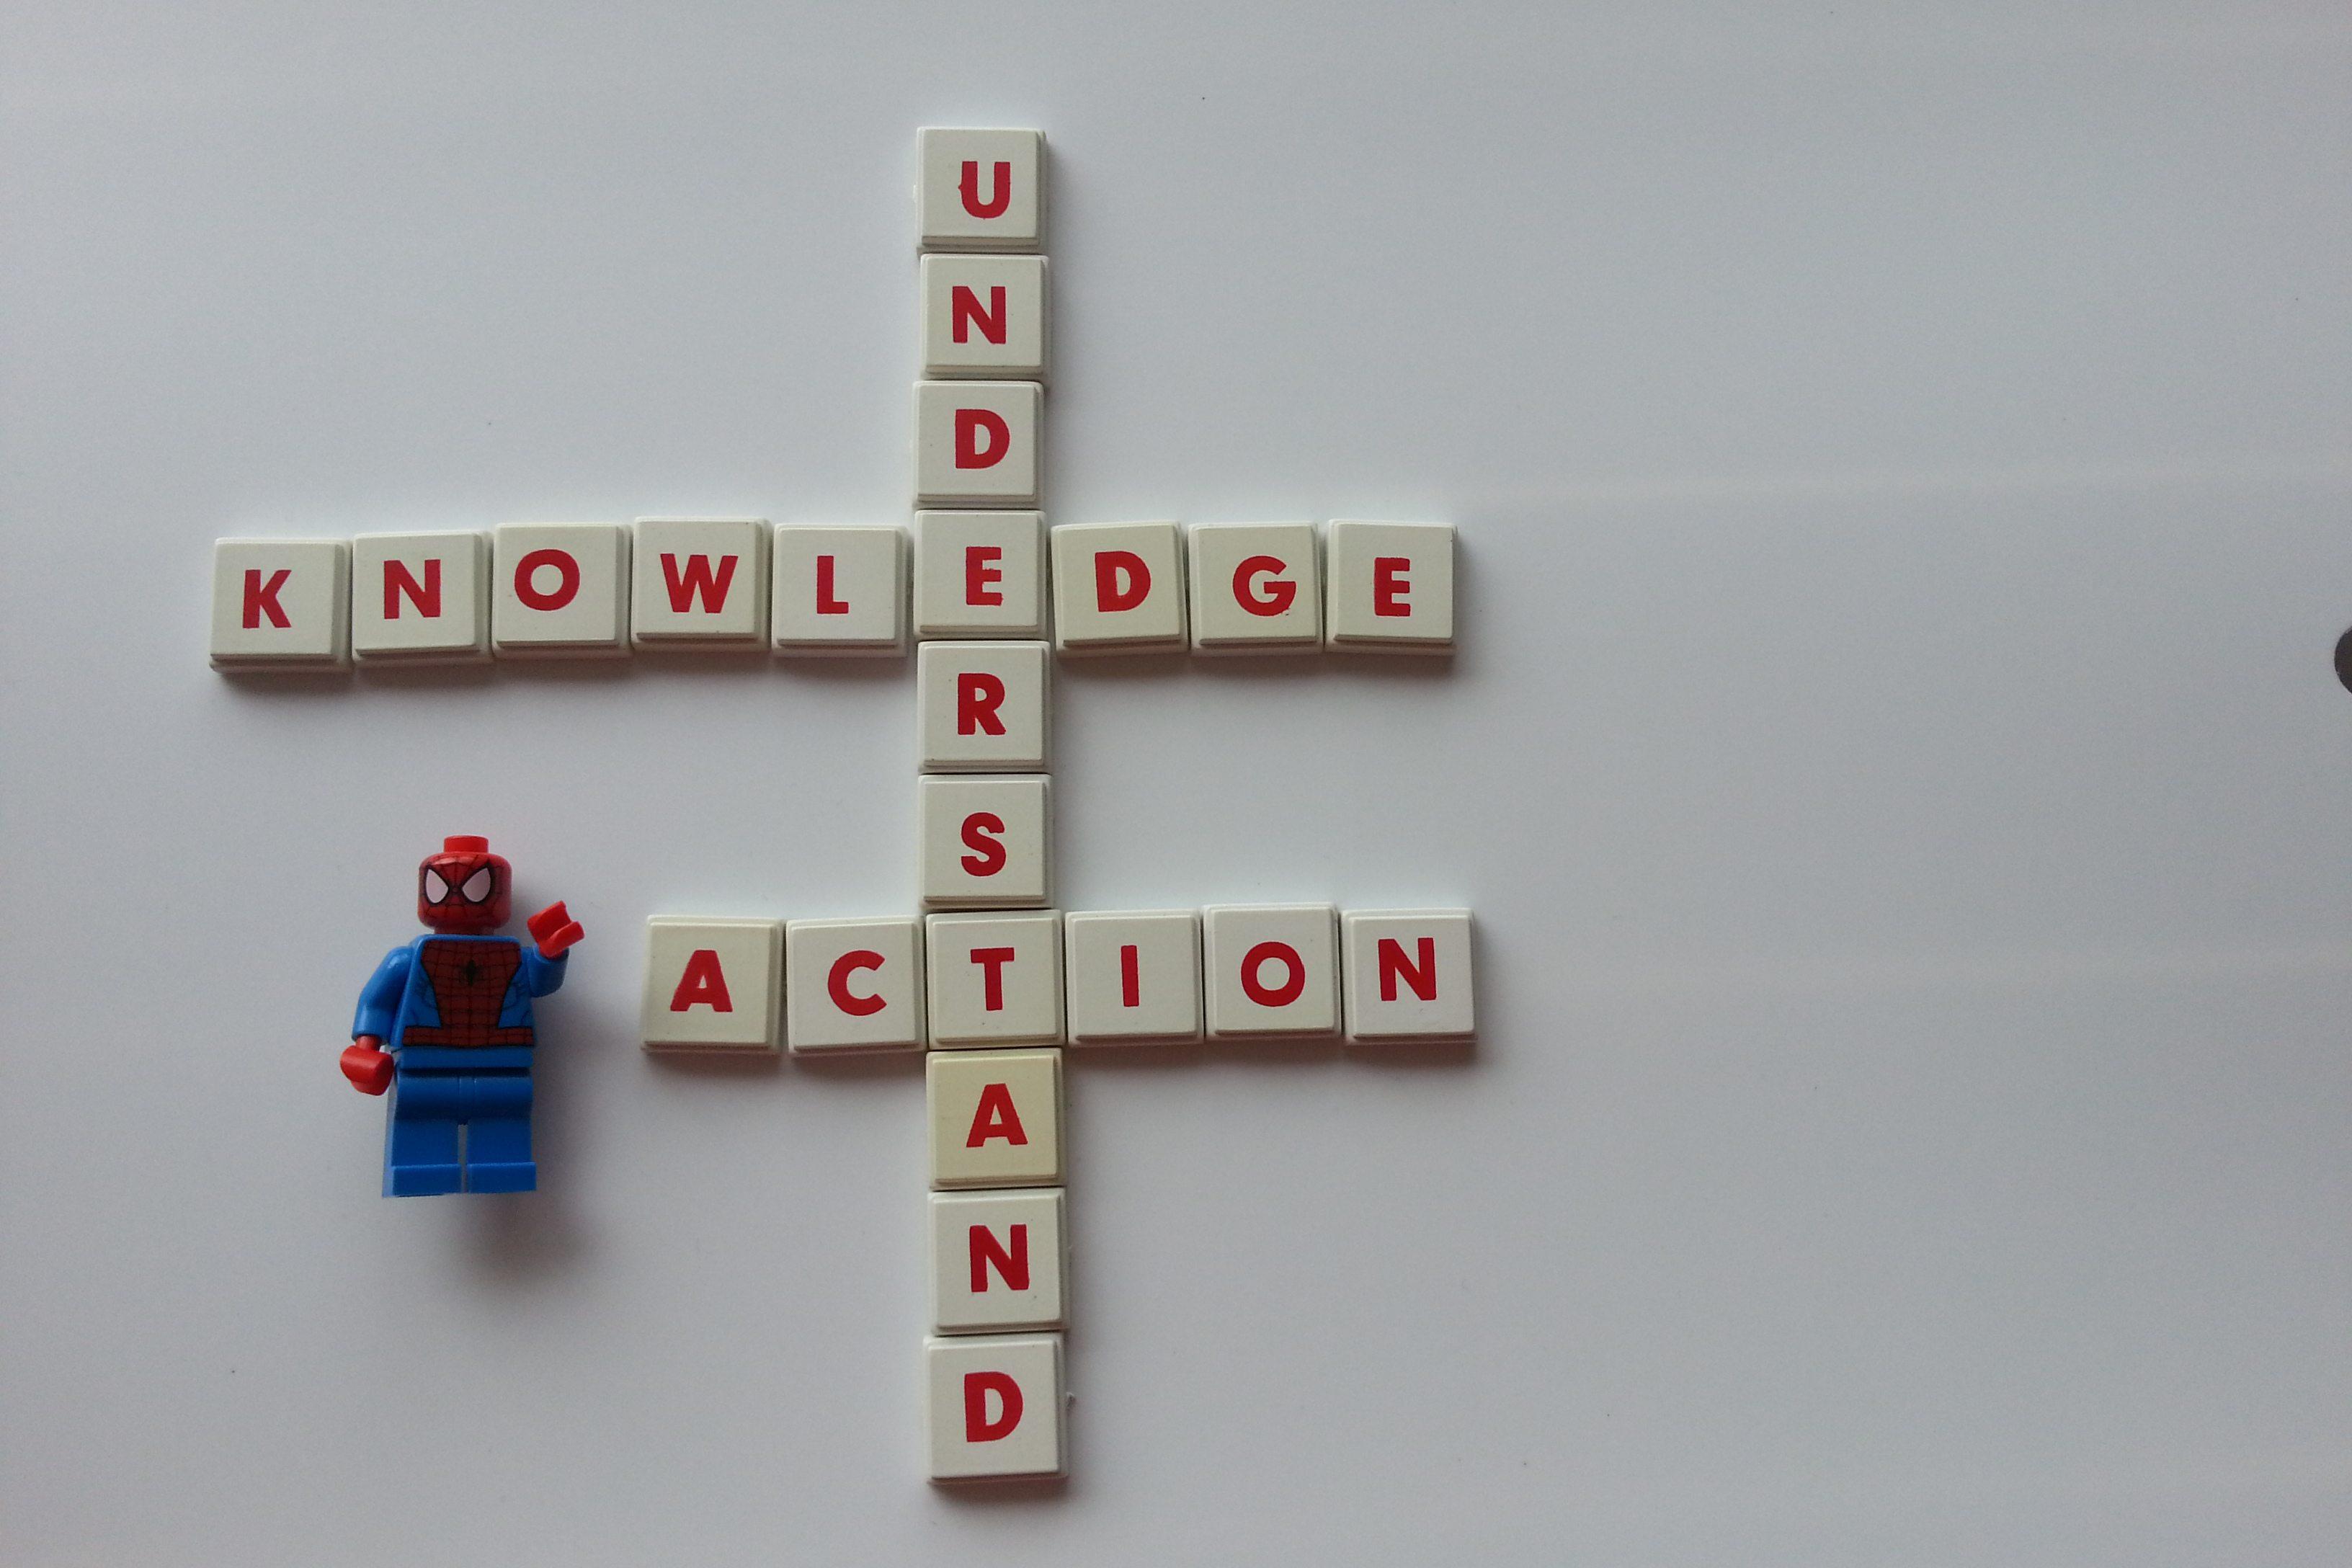 knowledge understanding action RapidBI business analysis & benchmarking tool